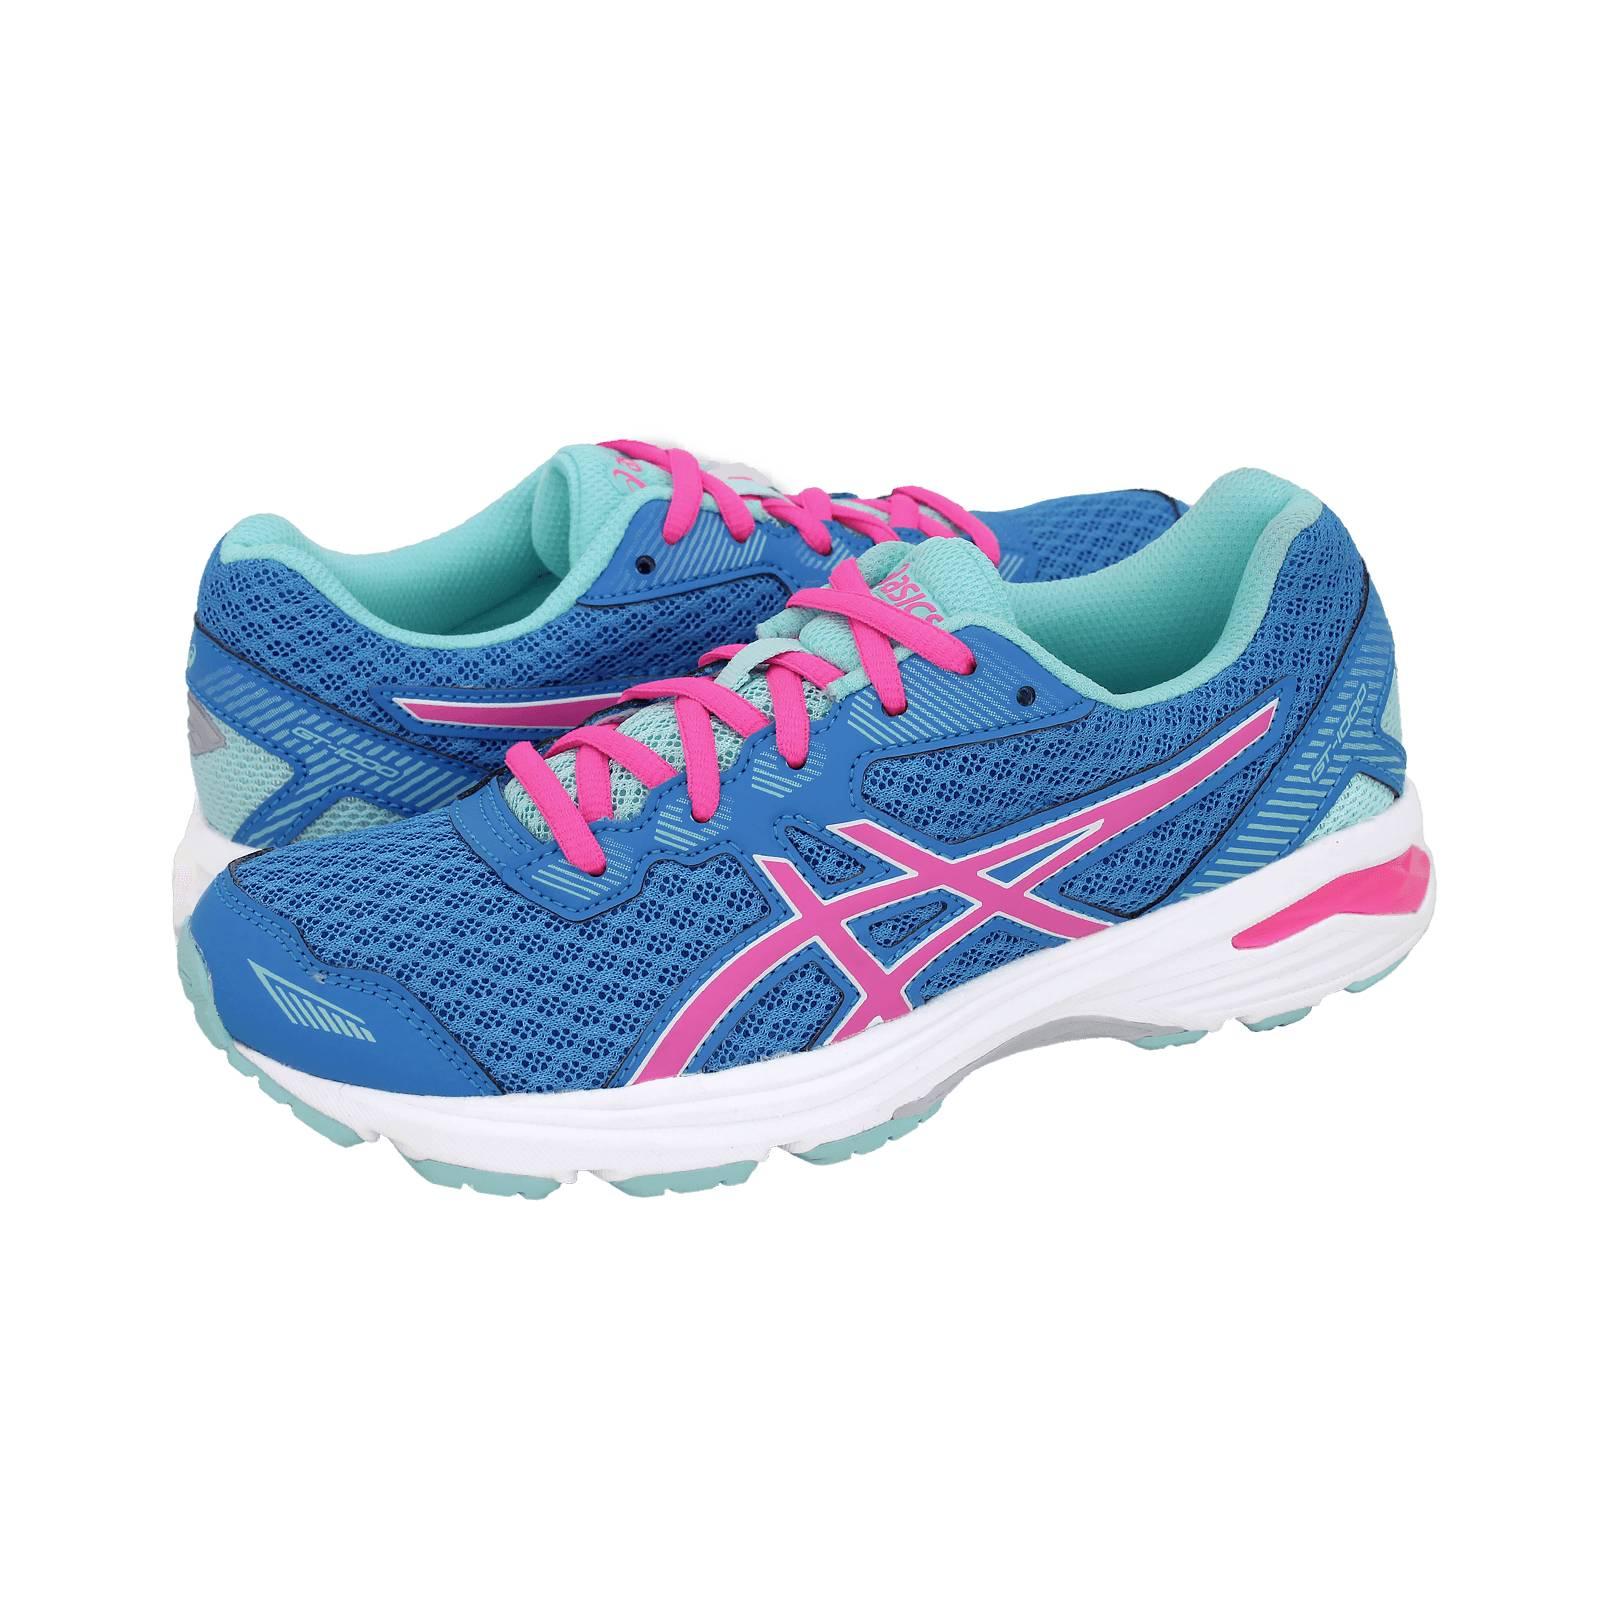 Asics GT 1000 5 GS athletic kids' shoes